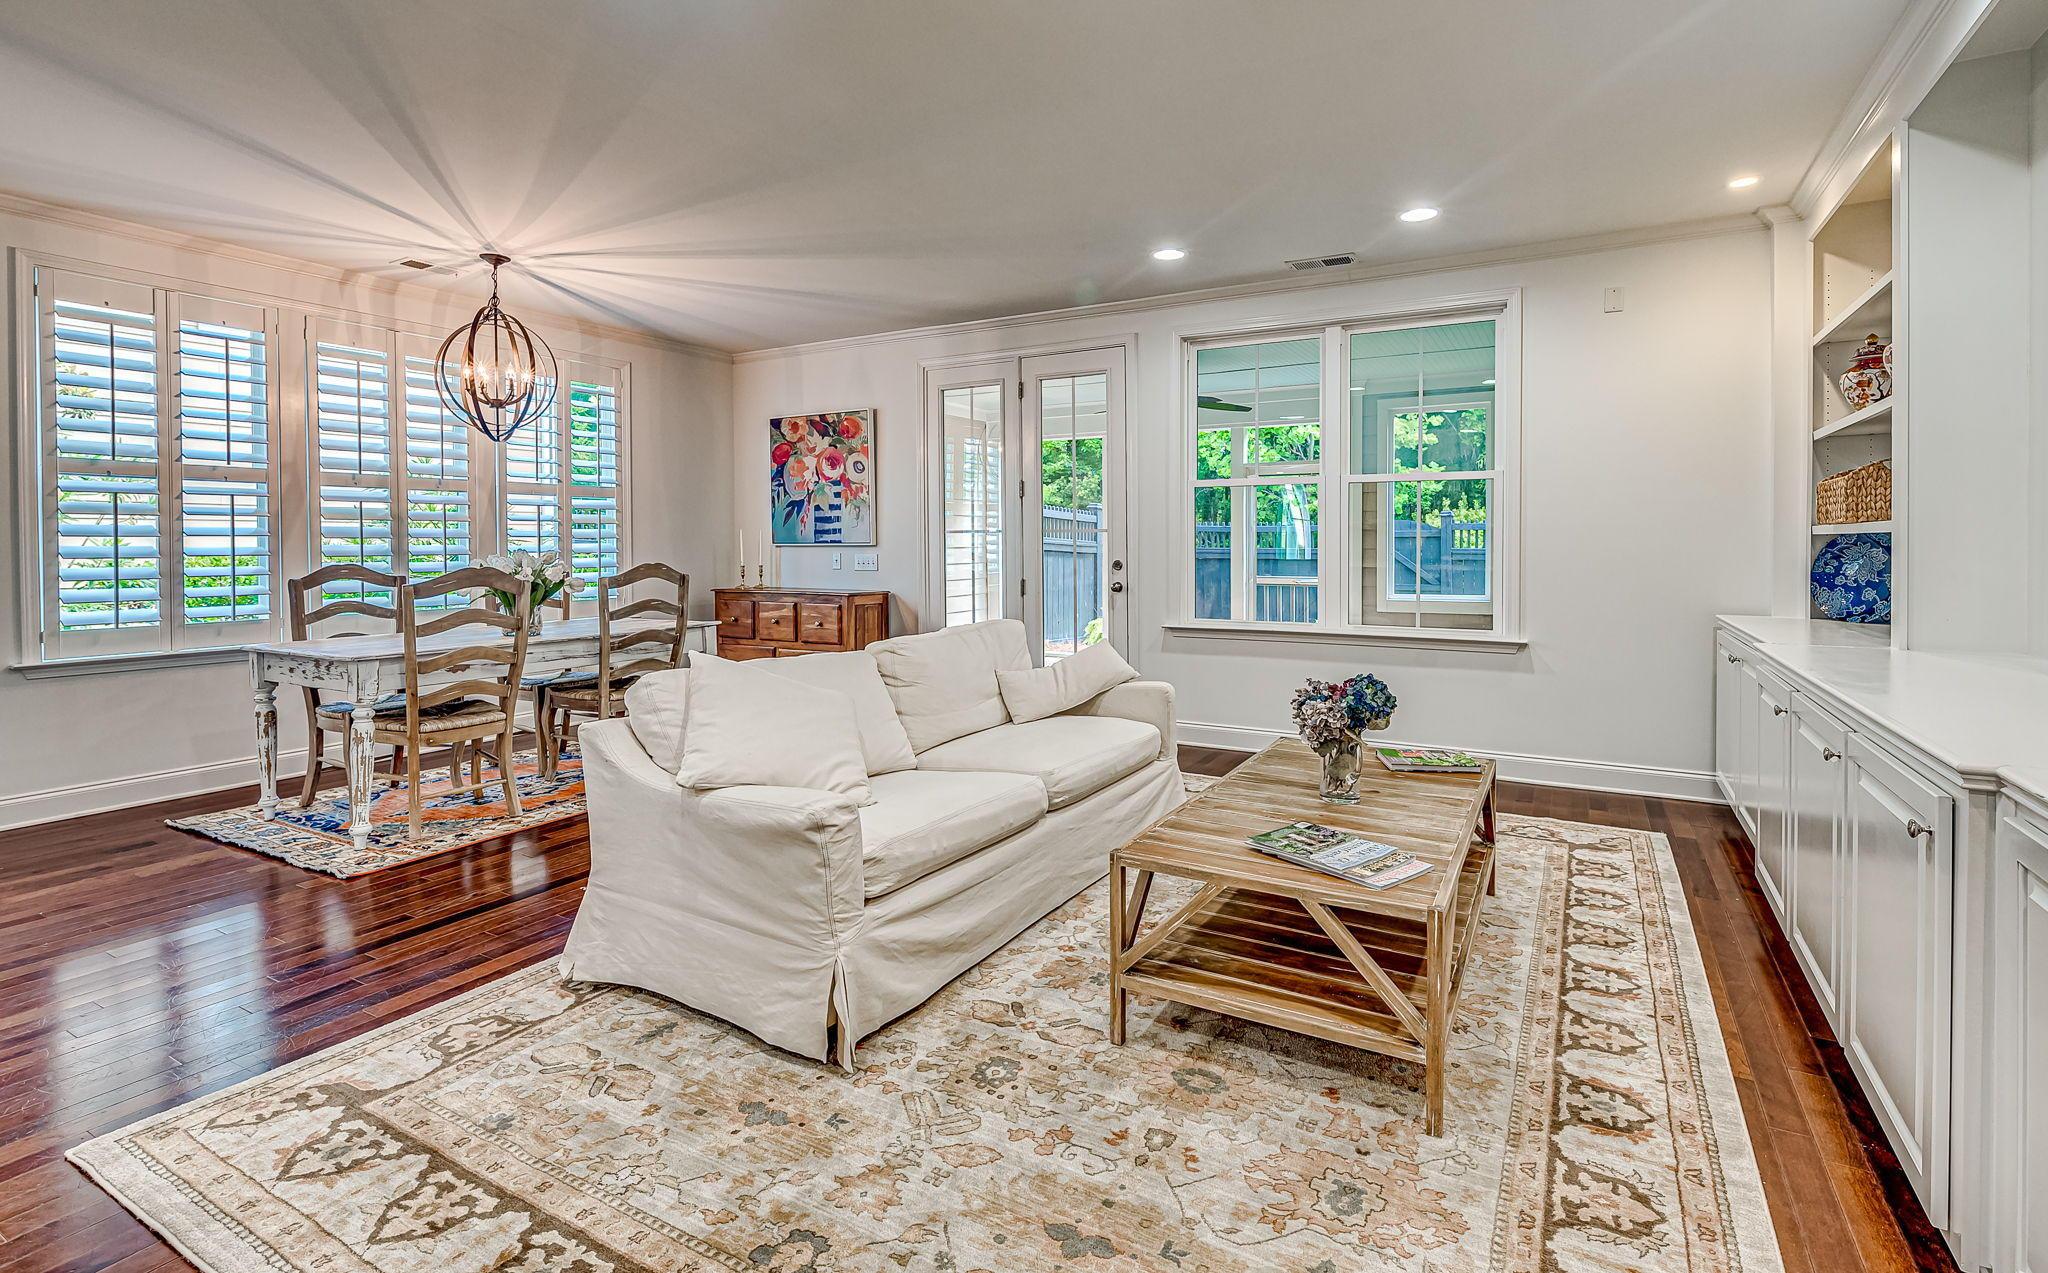 Dunes West Homes For Sale - 2476 Kings Gate, Mount Pleasant, SC - 2